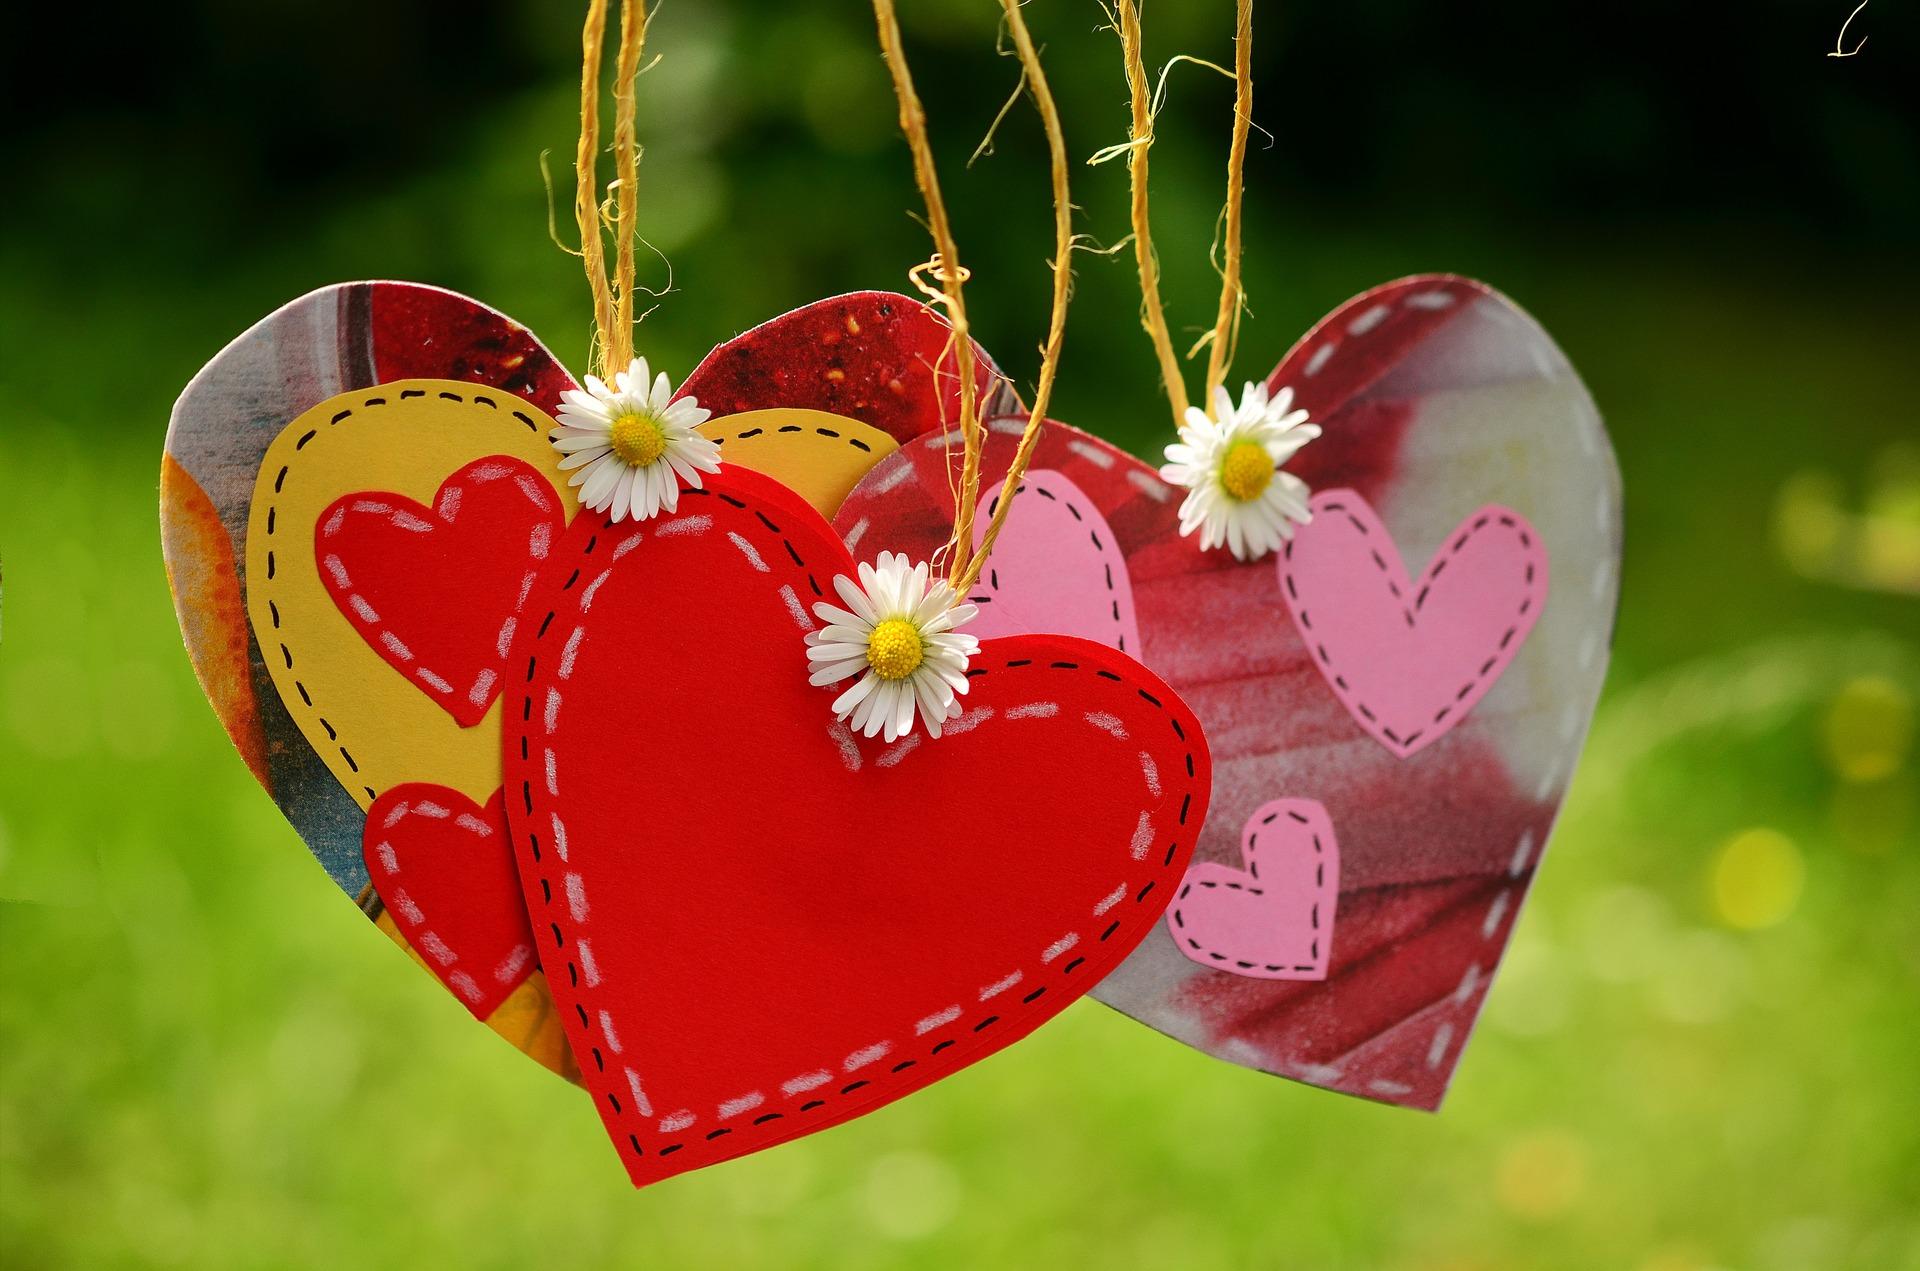 heart-1450302_1920